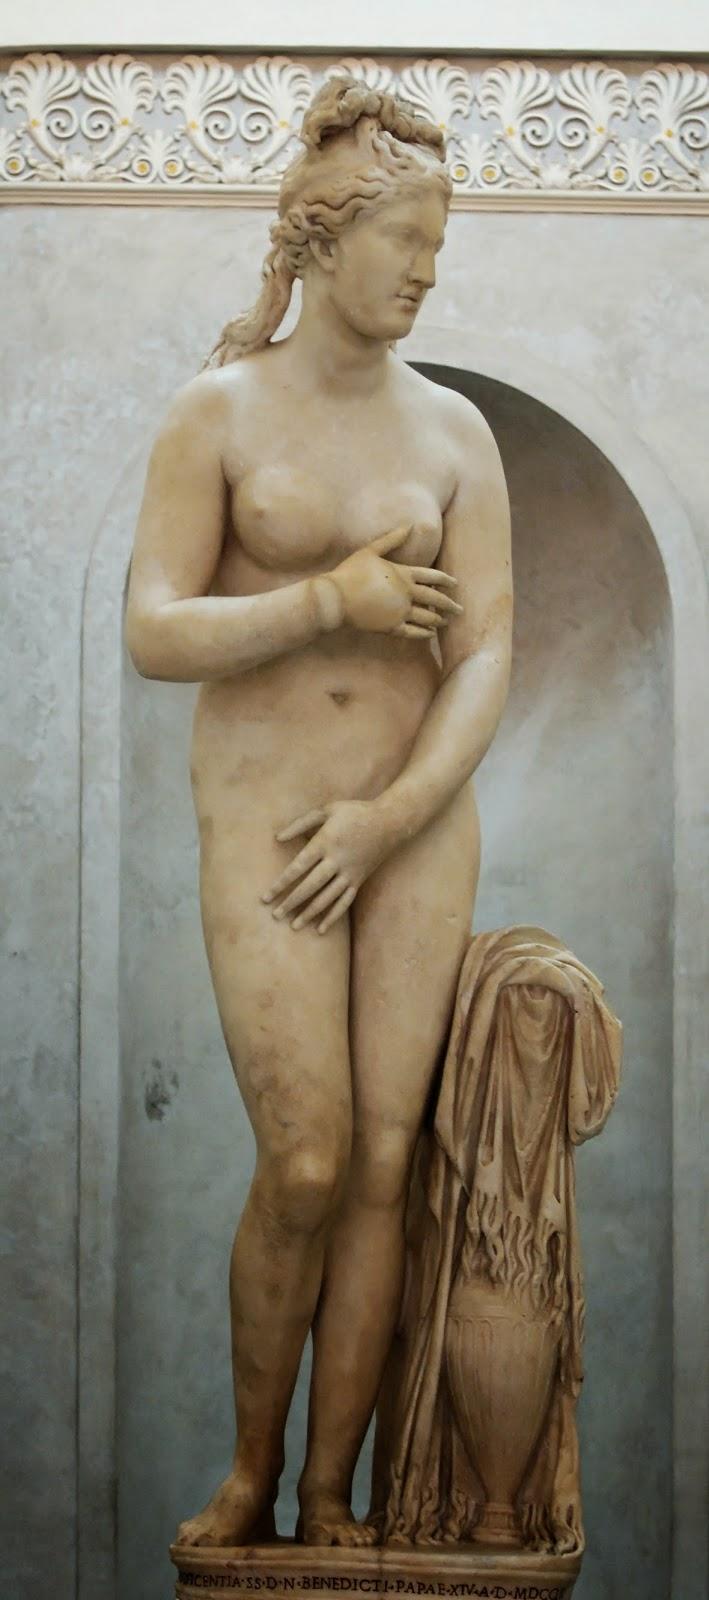 Marquis huston nude, hardcore sex phillipine